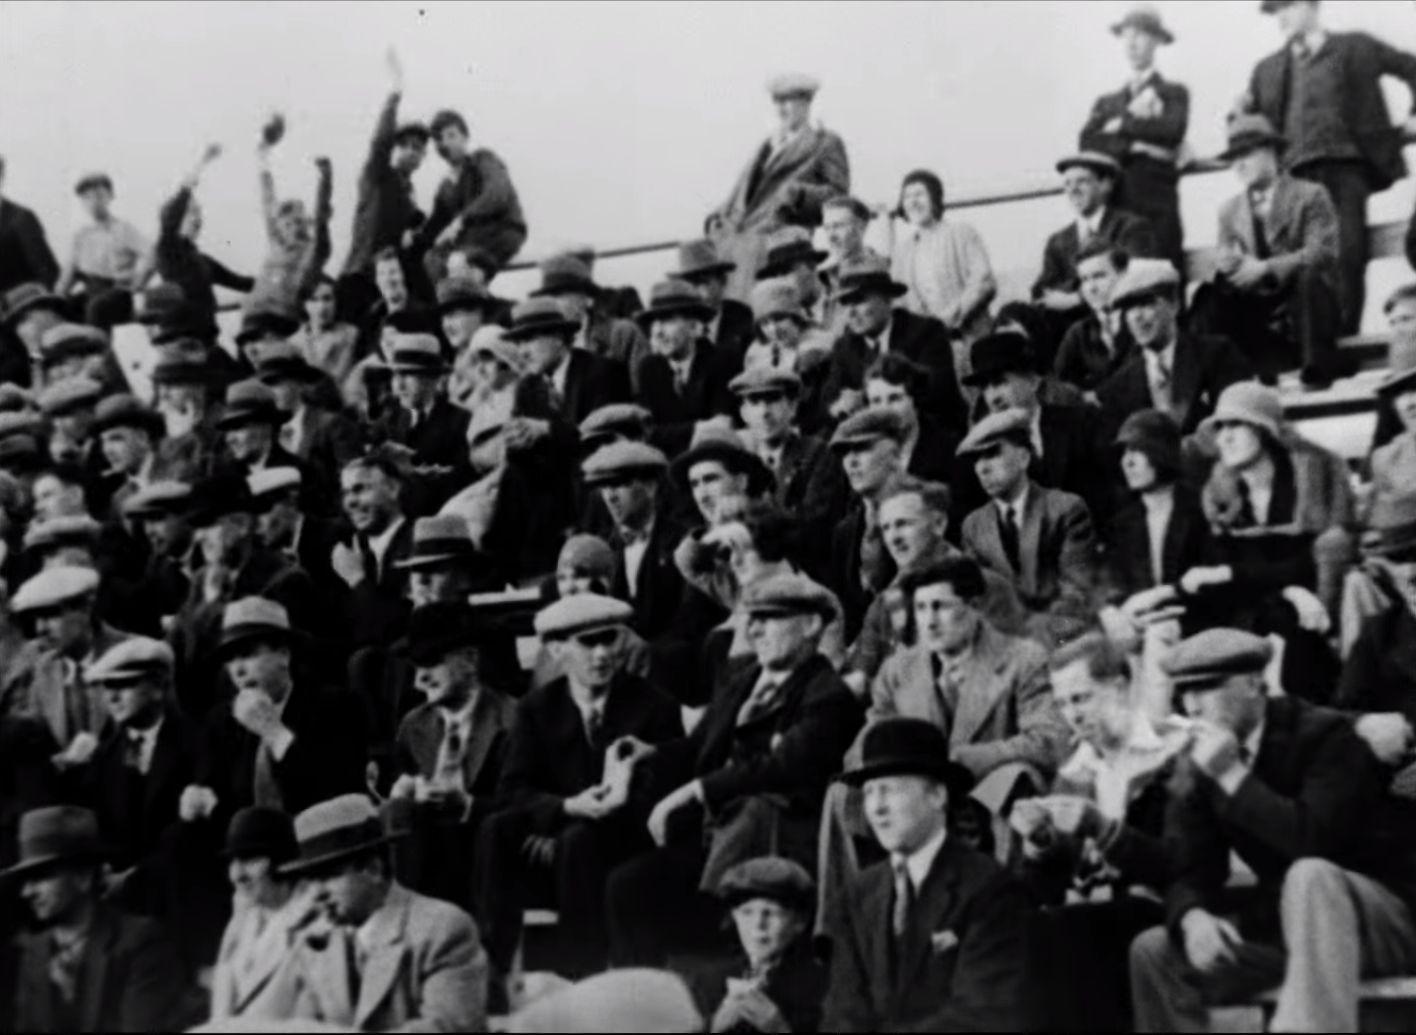 Spectators bleachers